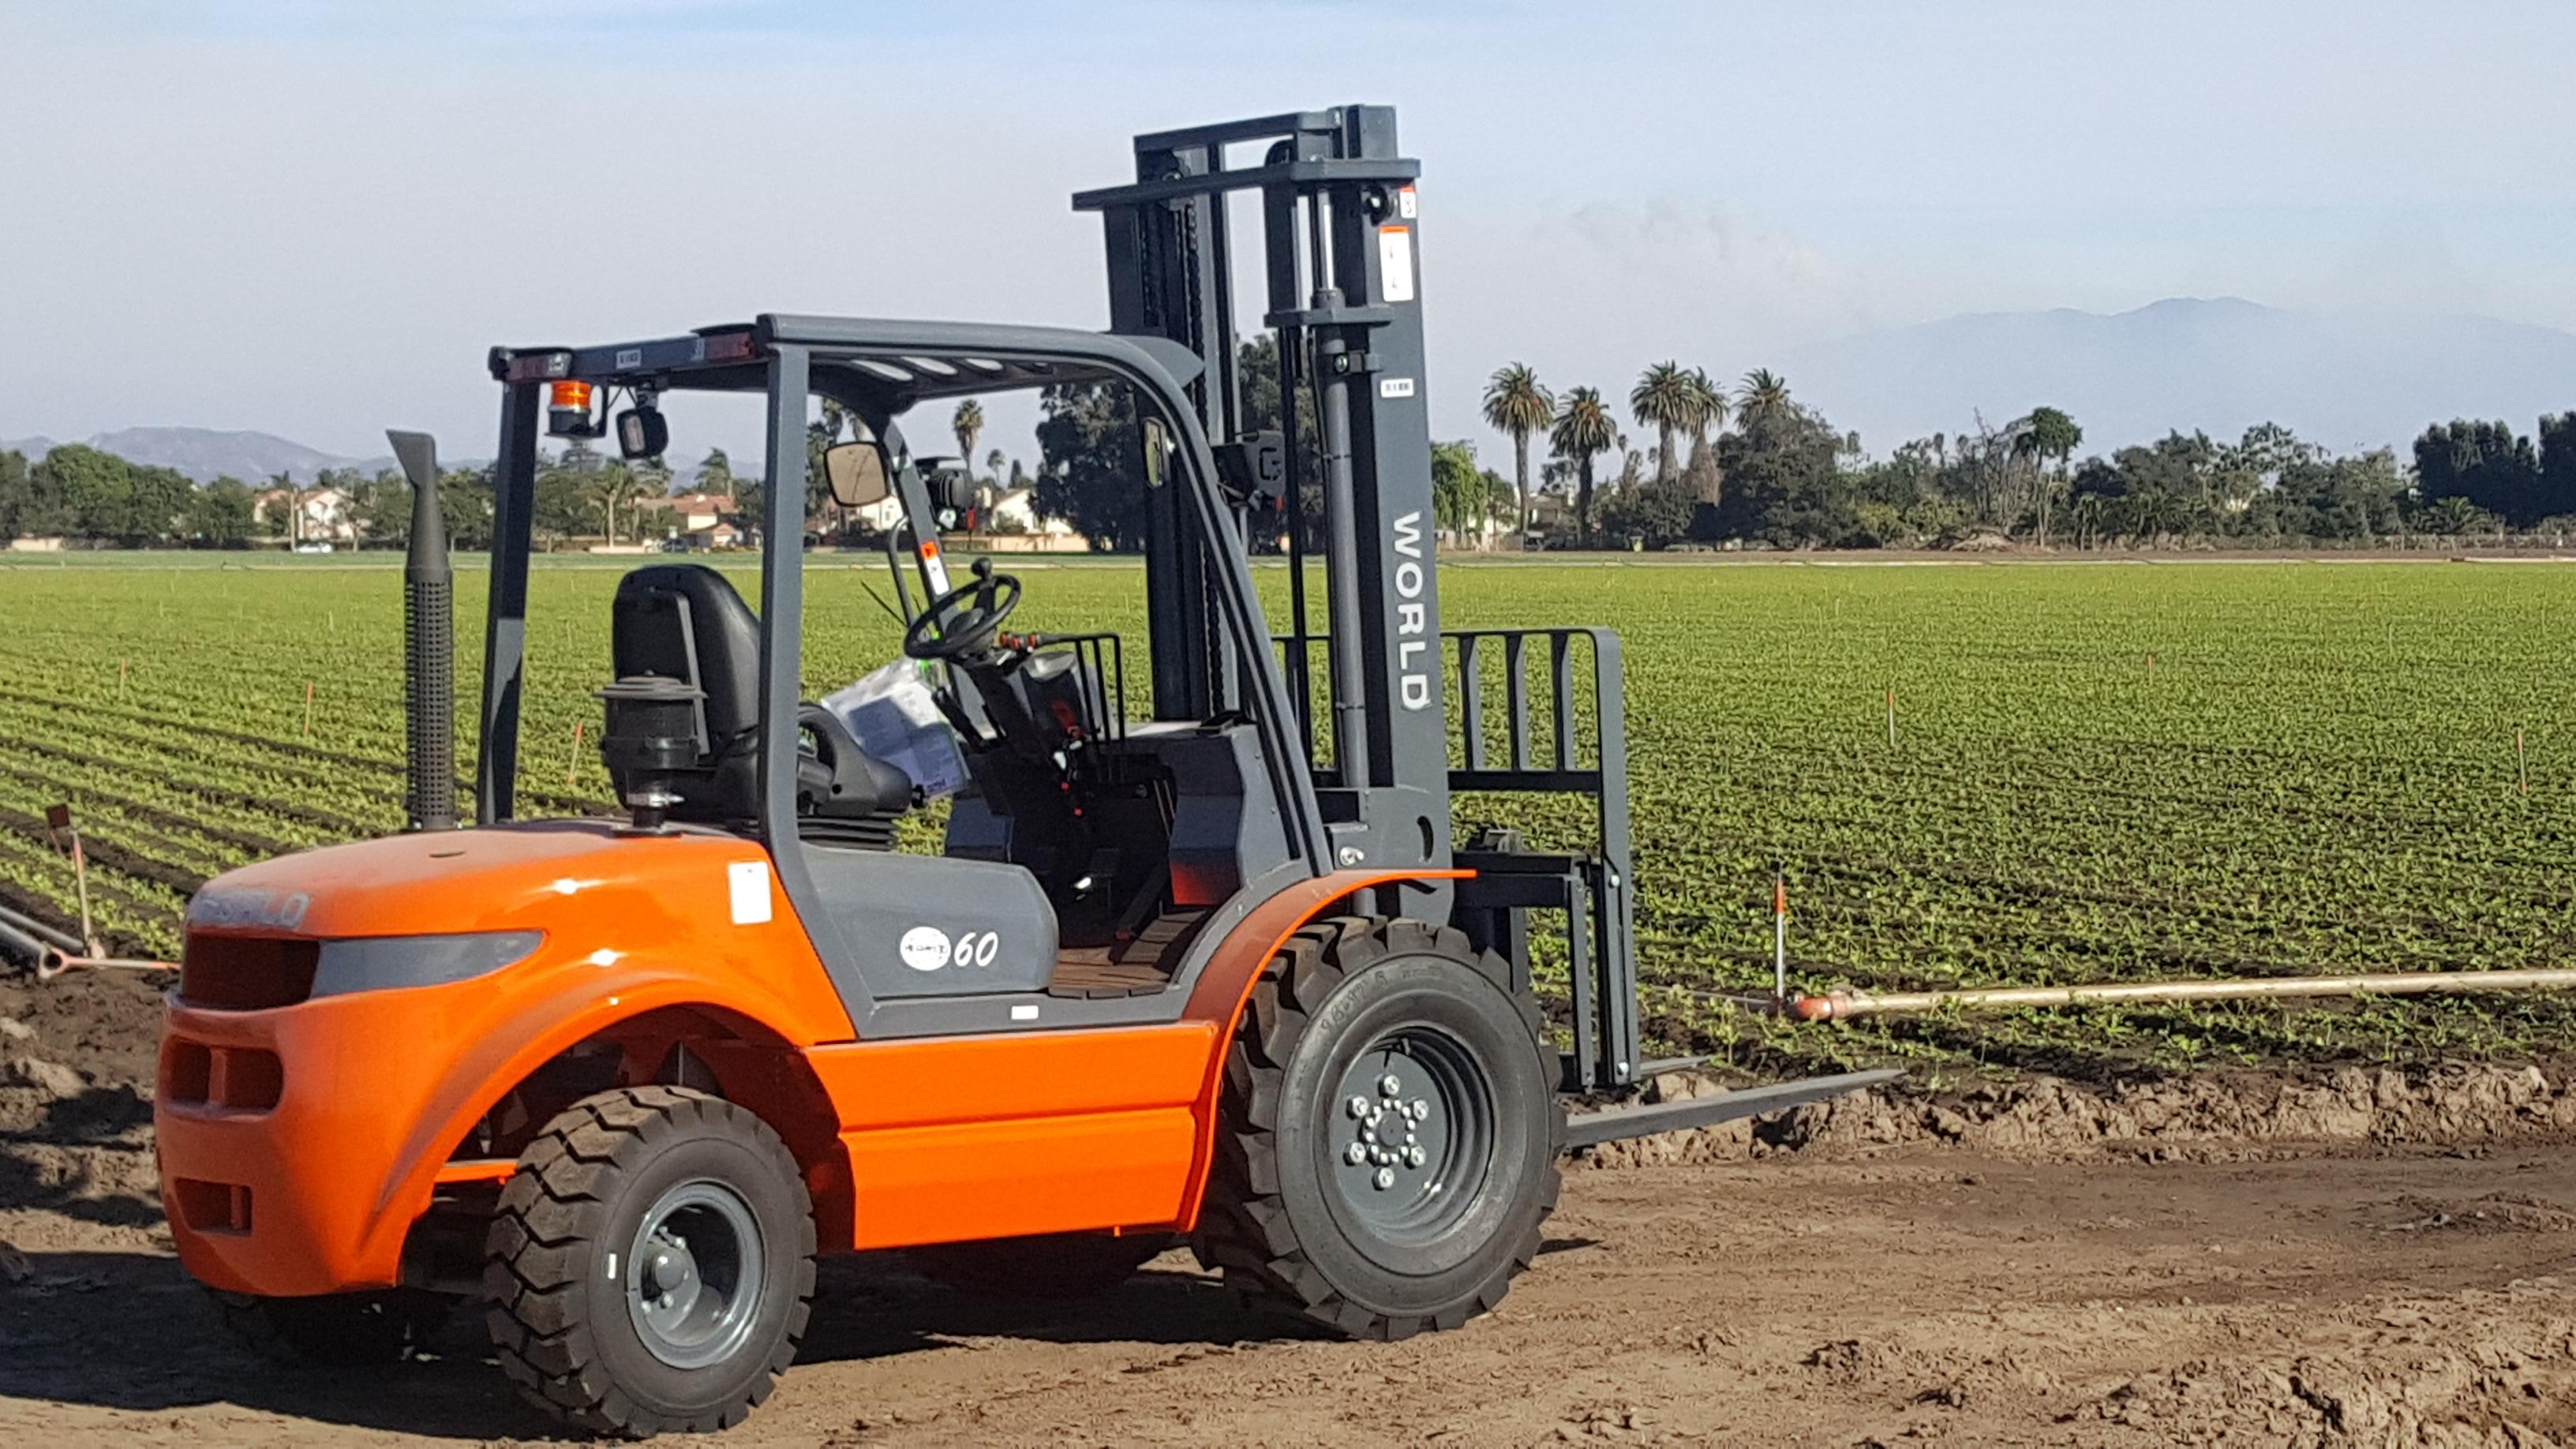 2WD Rough Terrain Forklifts | Ventura | XL Lifts